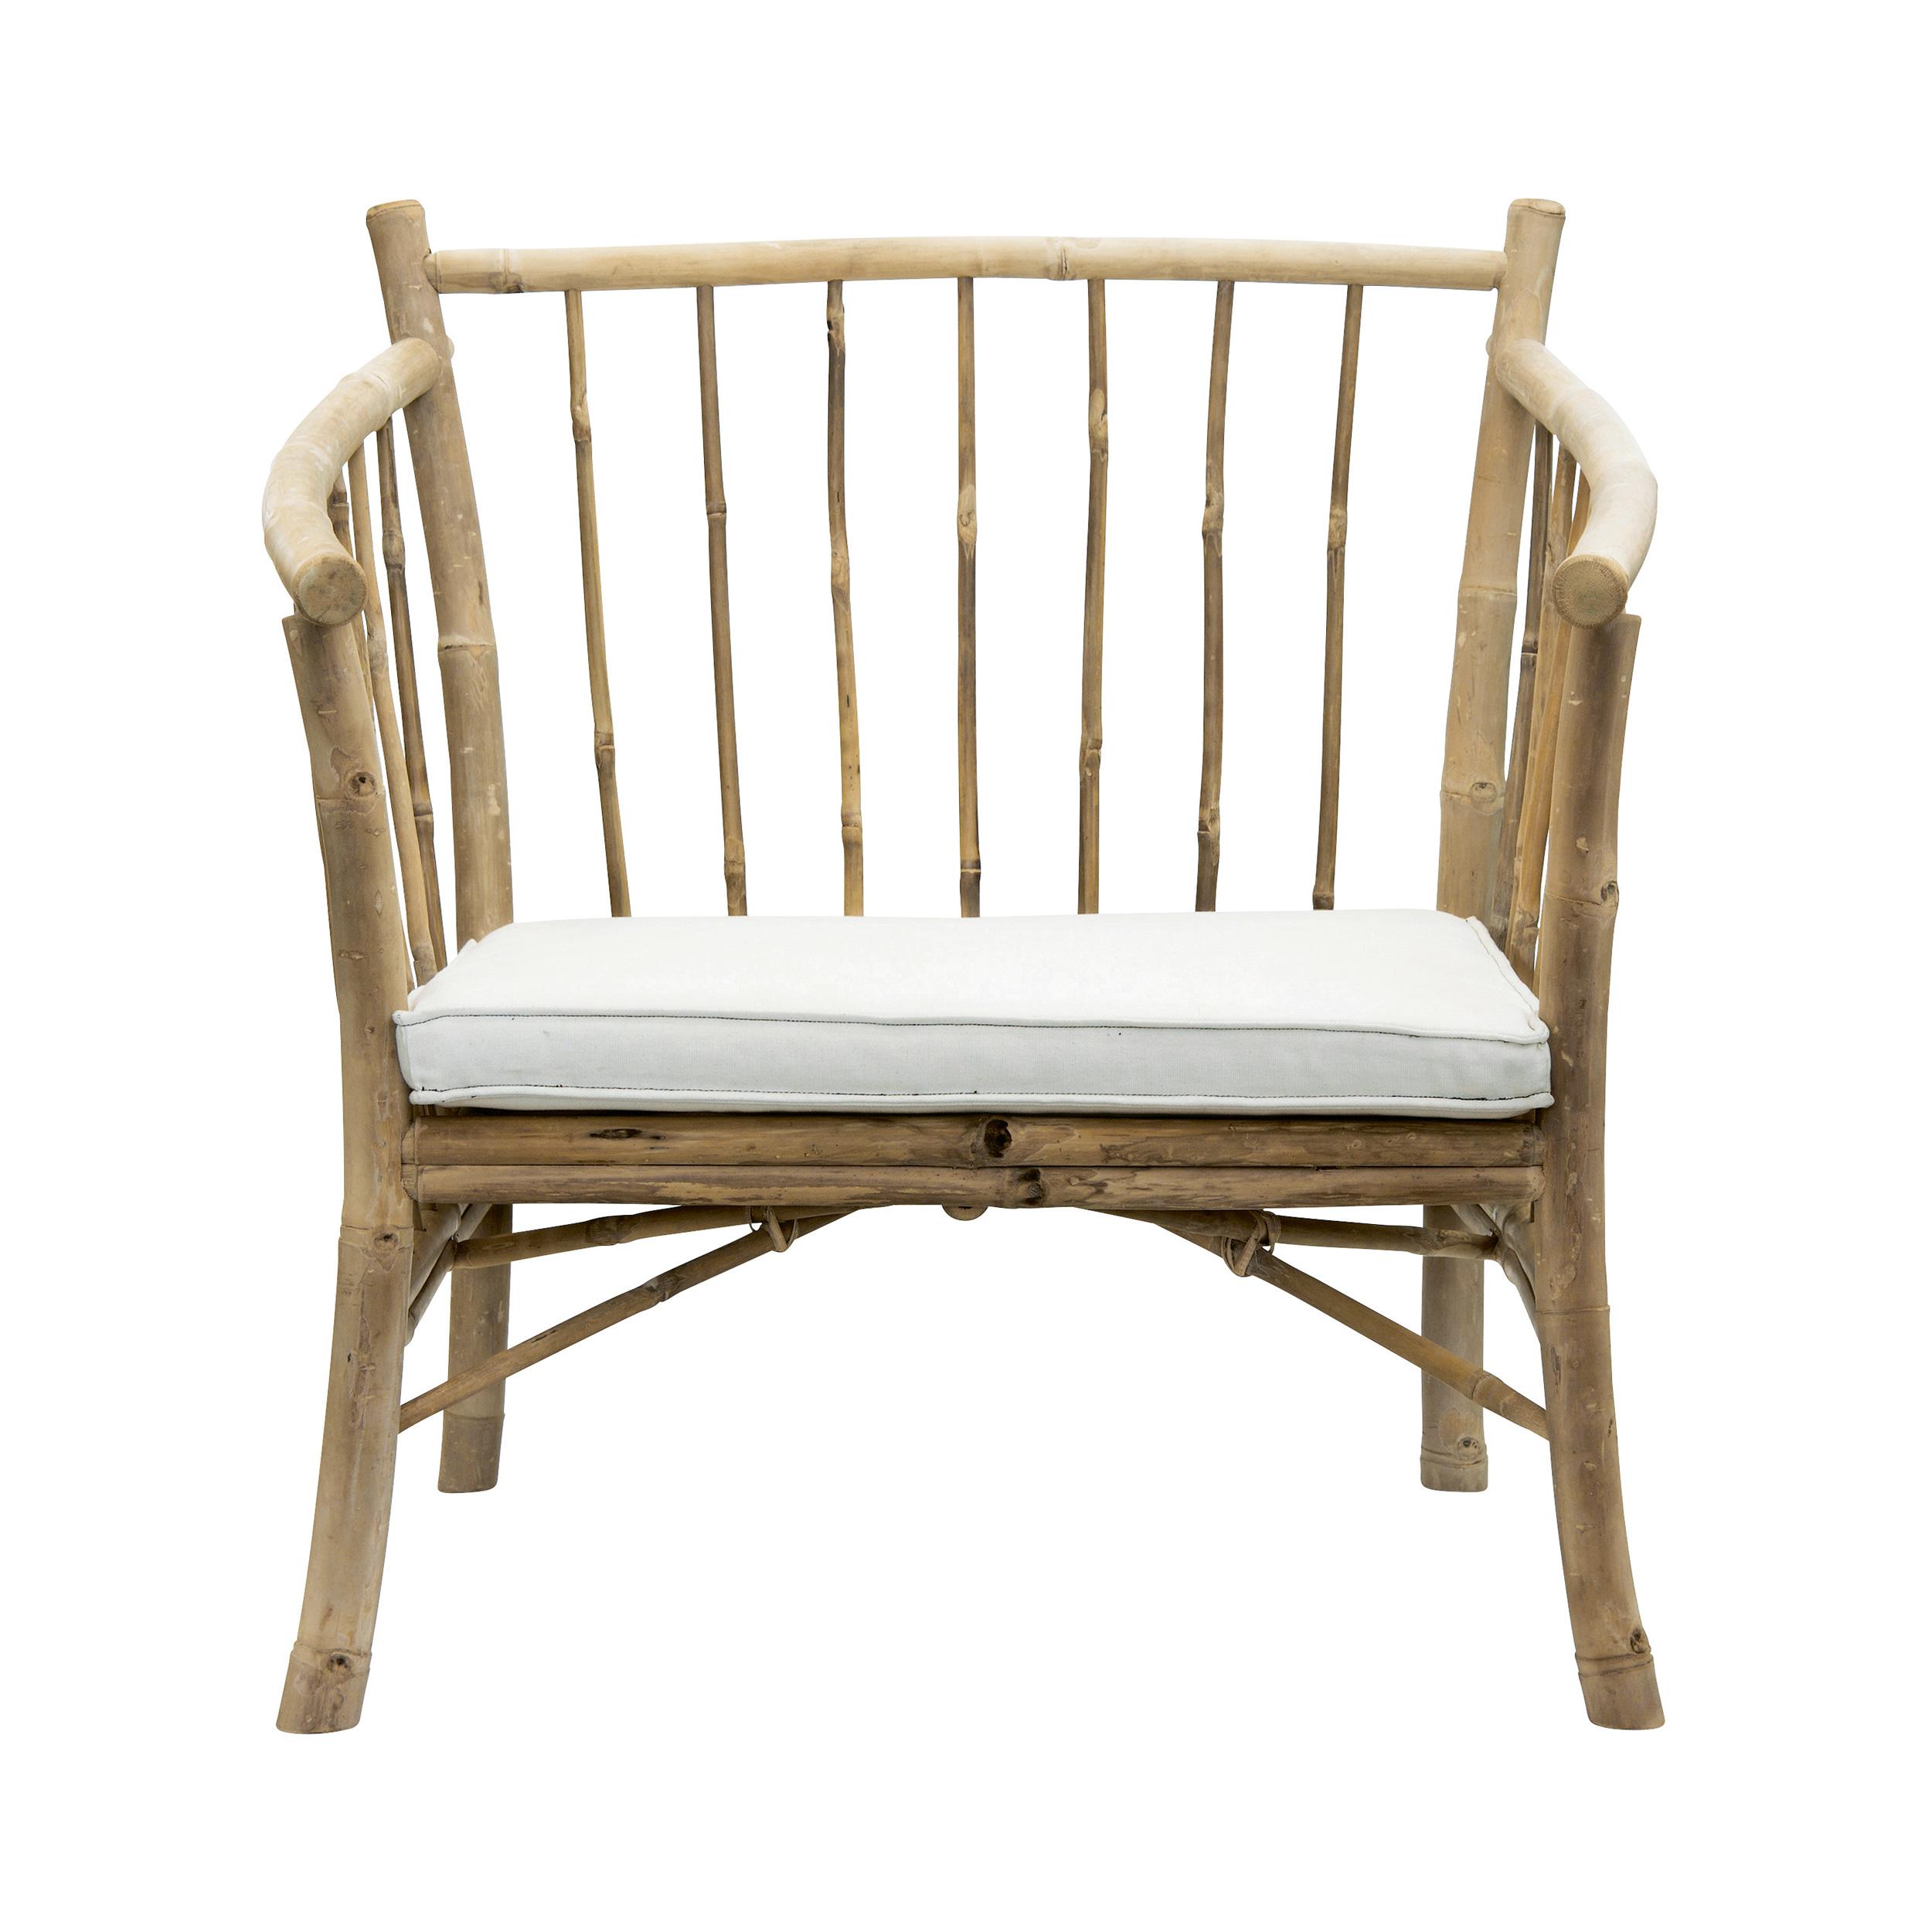 Various Sessel Berlin Ideas Of Bamboo - Outdoor-sessel Mit Auflage - Erhältlich